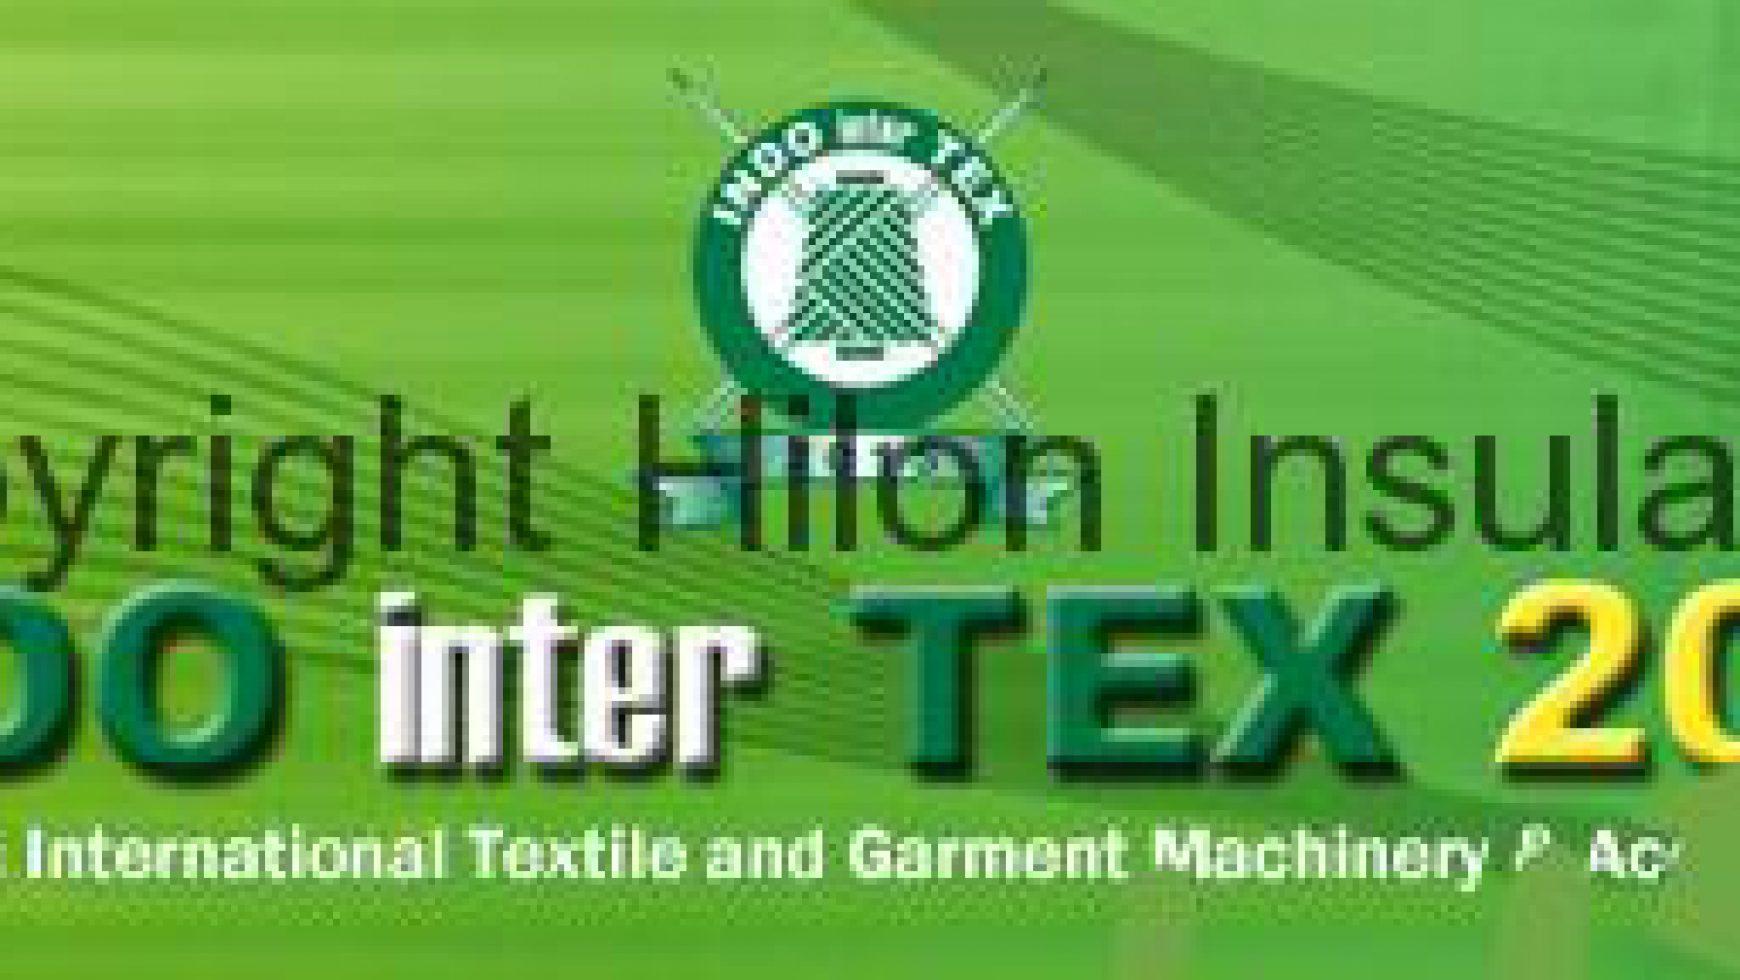 INATEX 2015 – The 13th Indonesia International Creative Textile Apparel Accessories Exhibition